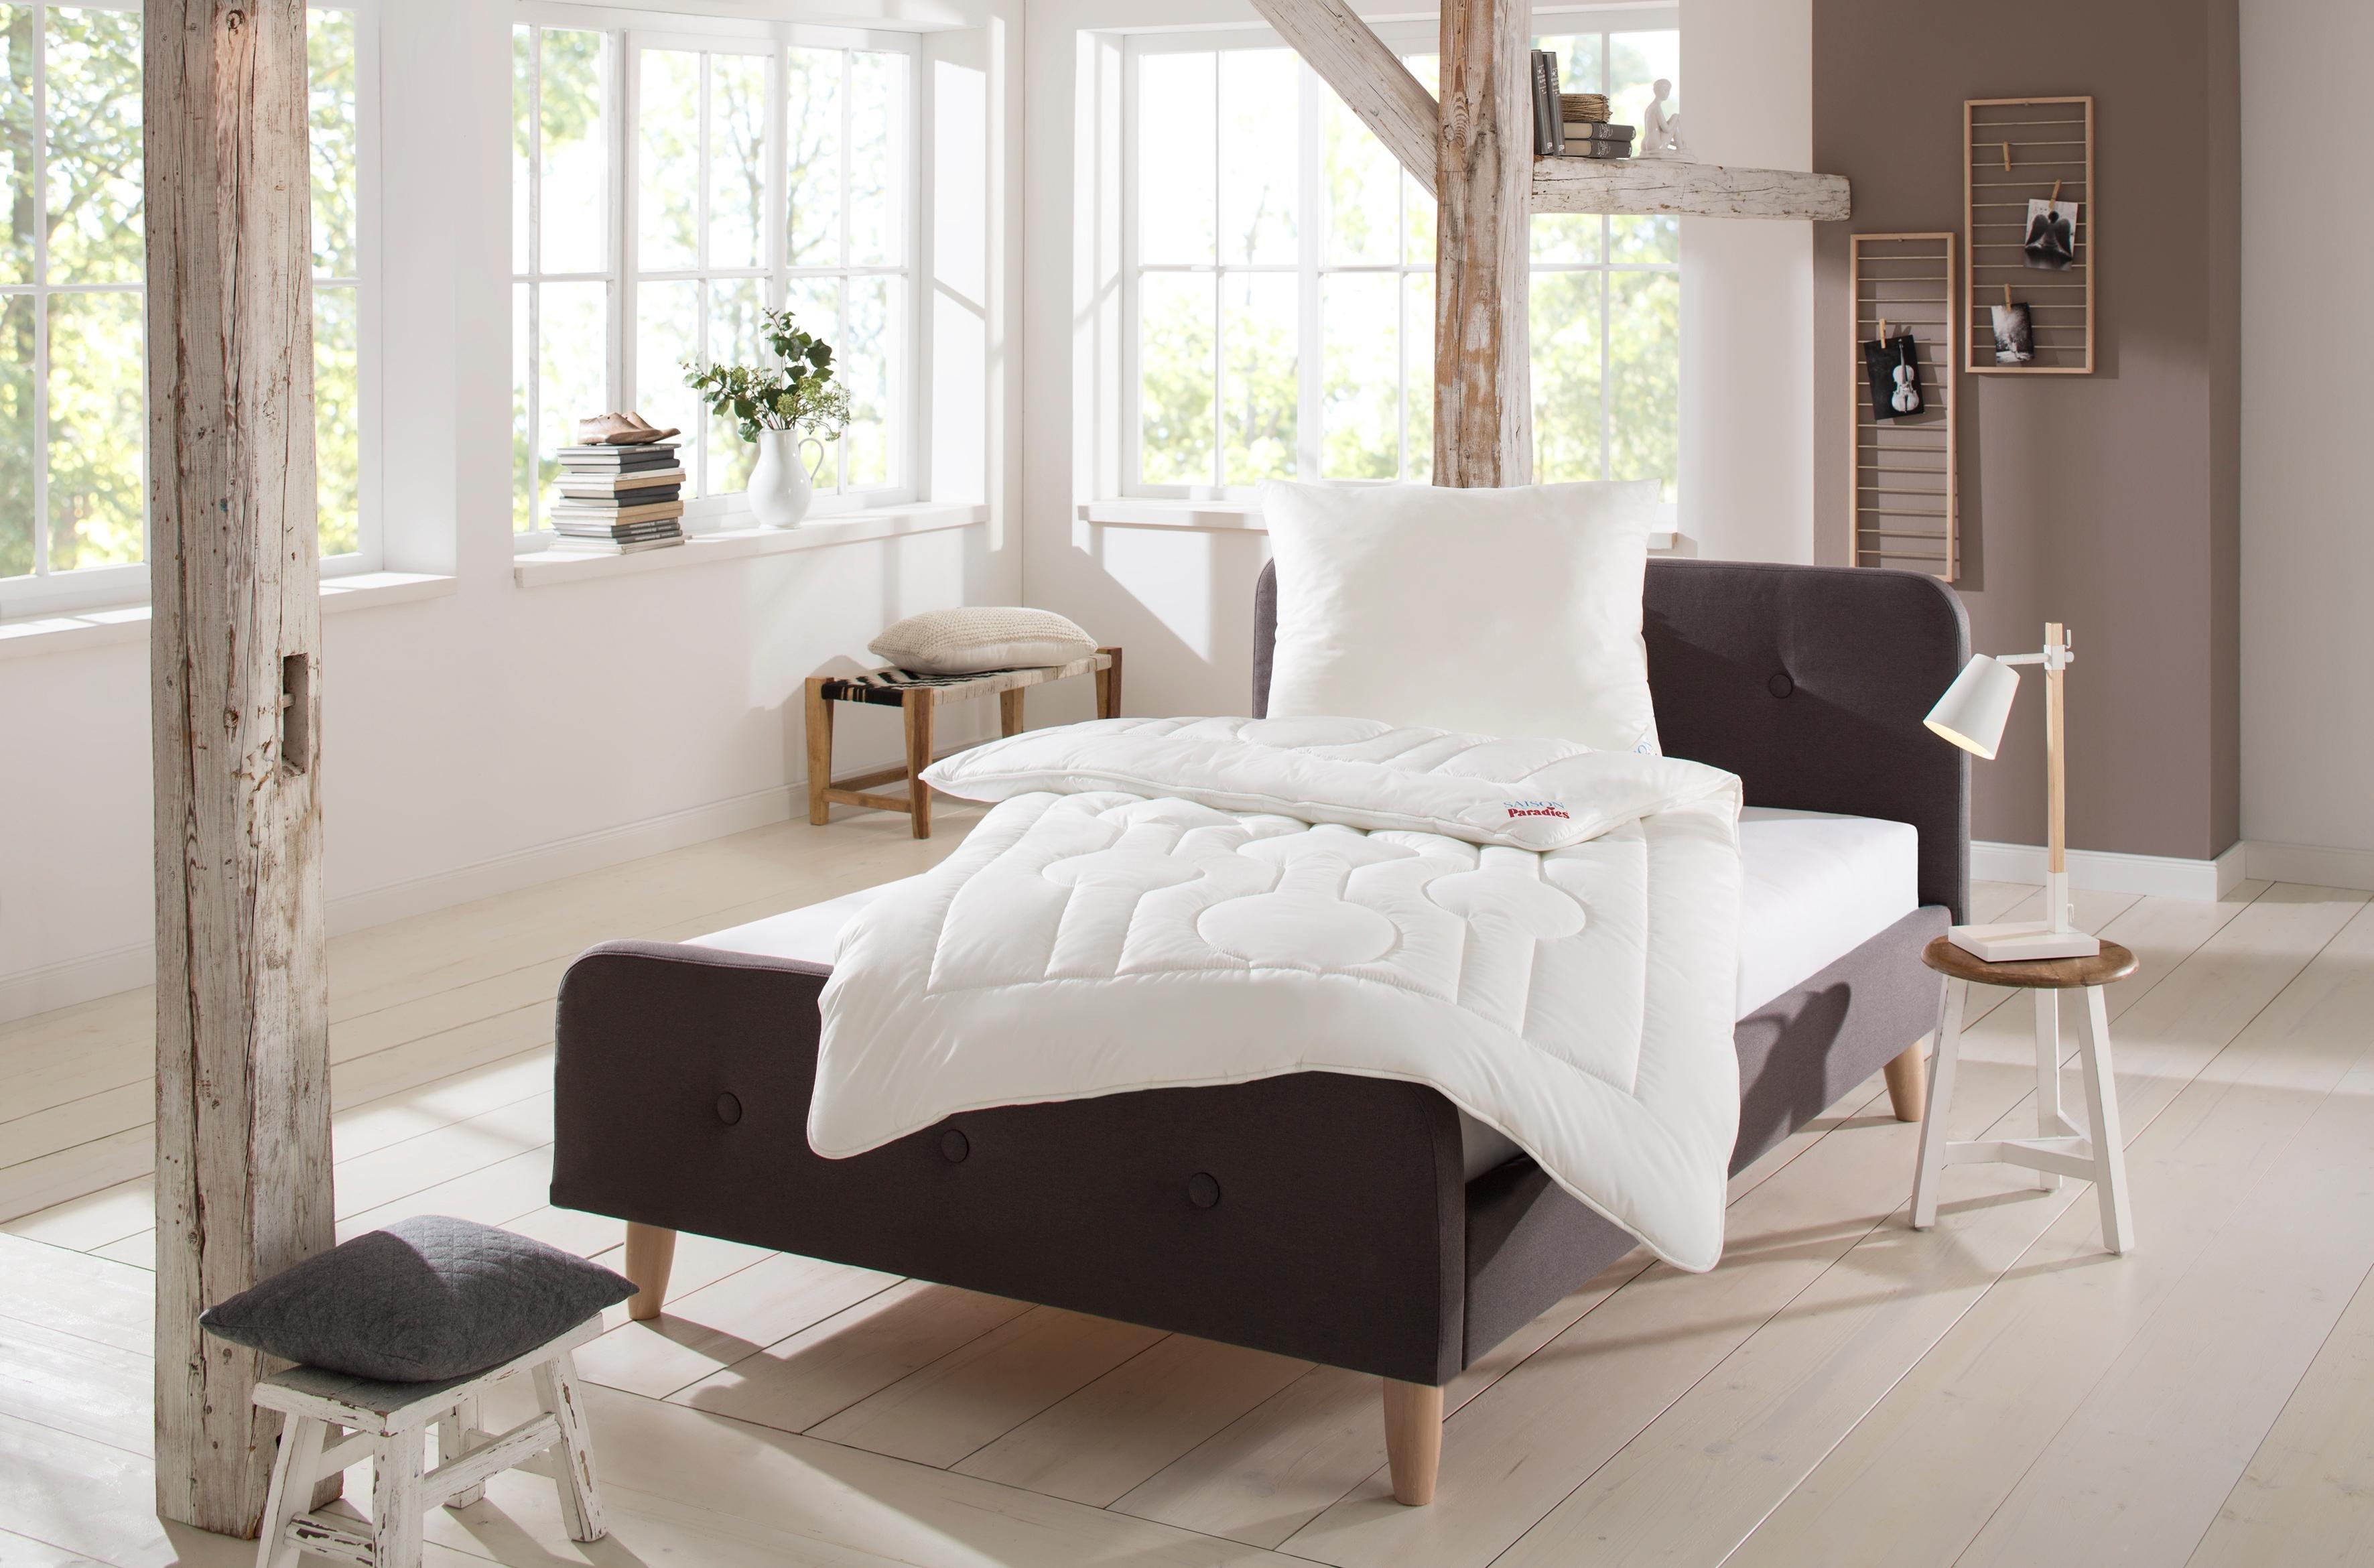 kamelhaarflaum bettdecken feng shui schlafzimmer blau lidl bettw sche flamingo t rkis braun set. Black Bedroom Furniture Sets. Home Design Ideas